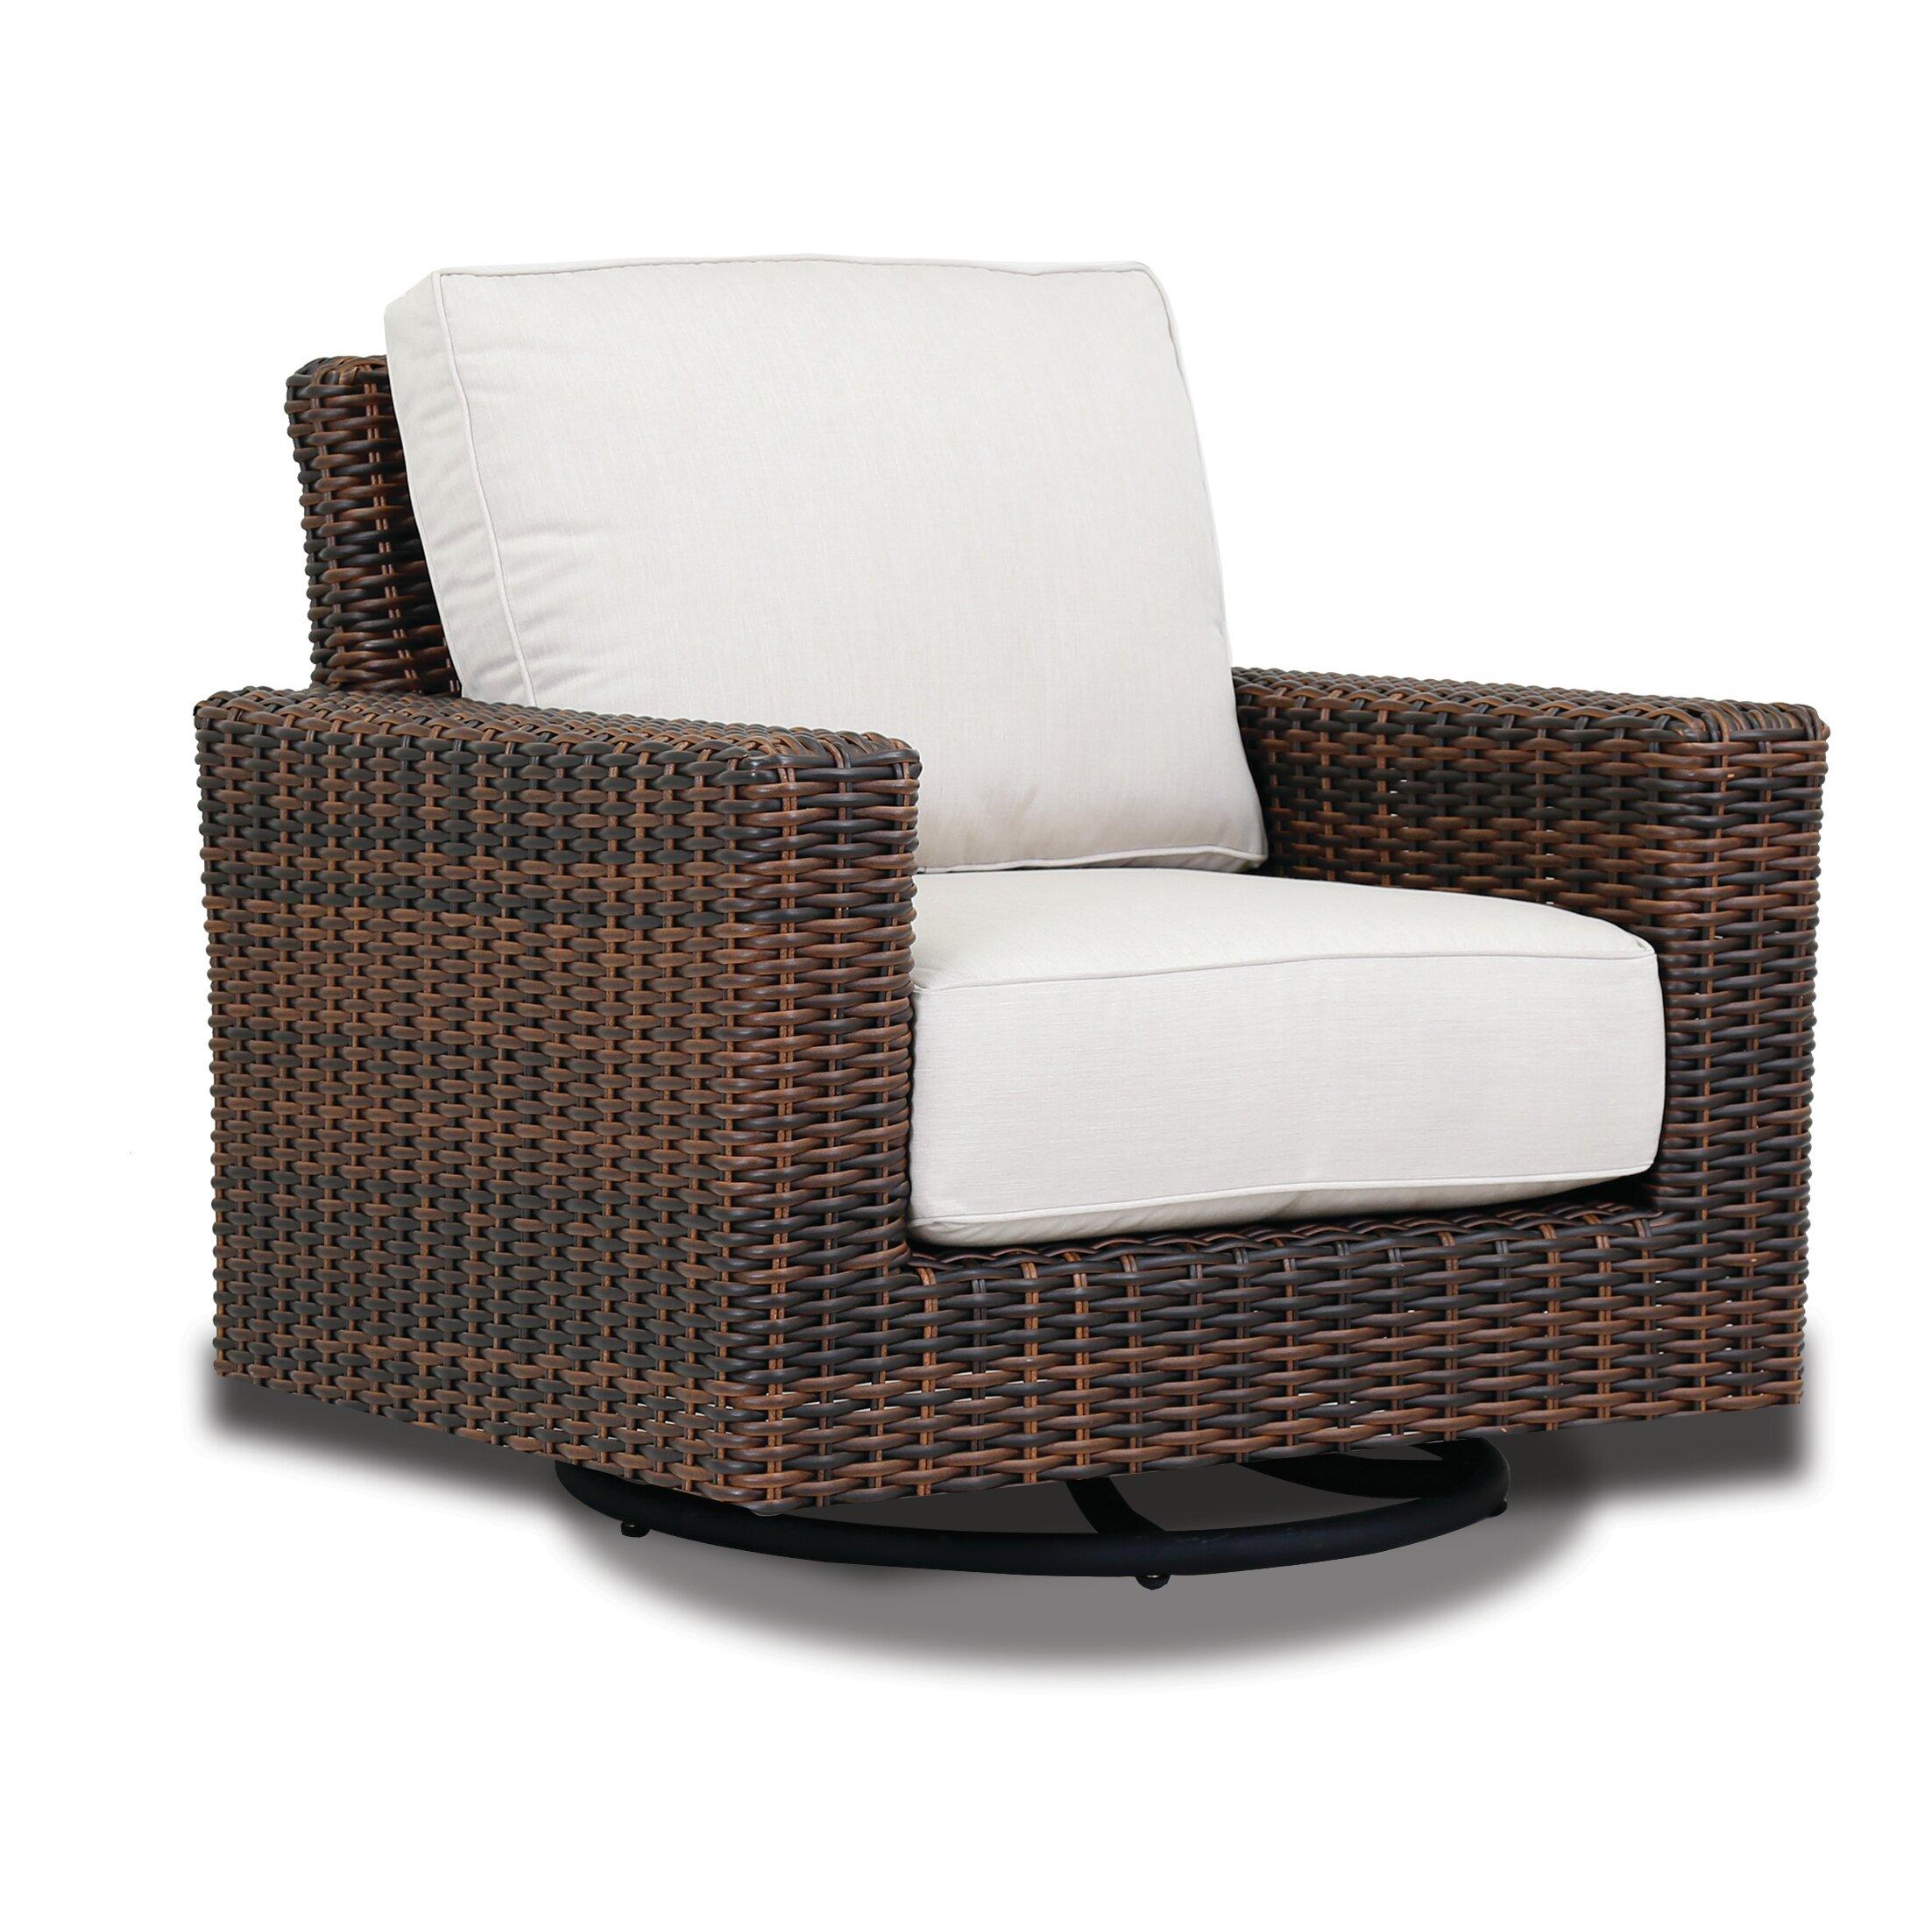 Montecito Swivel Rocker Patio Chair